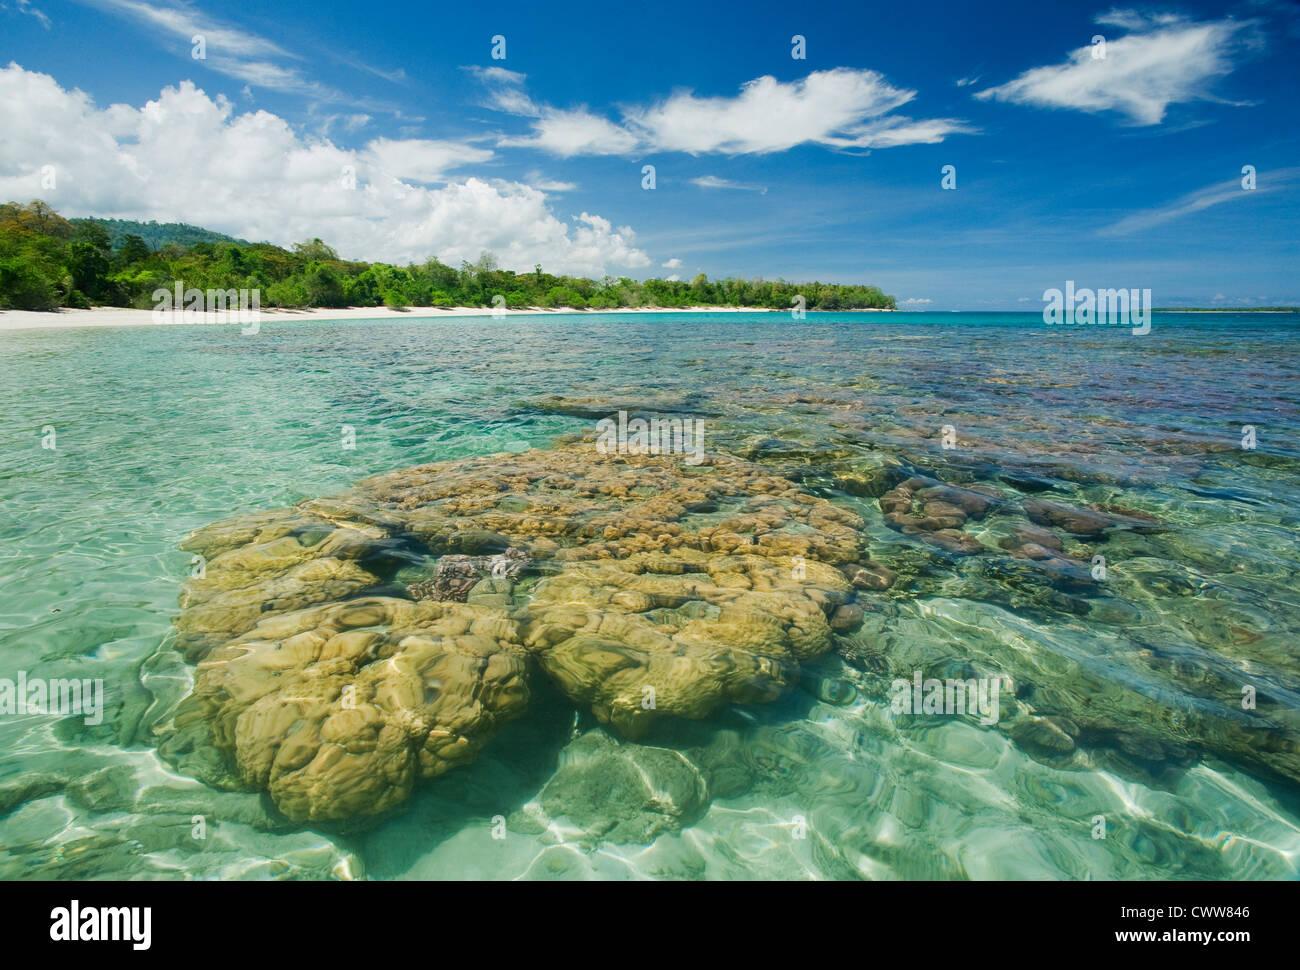 Coral heads, beach near Taima, Tompotika Peninsula, Central Sulawesi, Indonesia - Stock Image